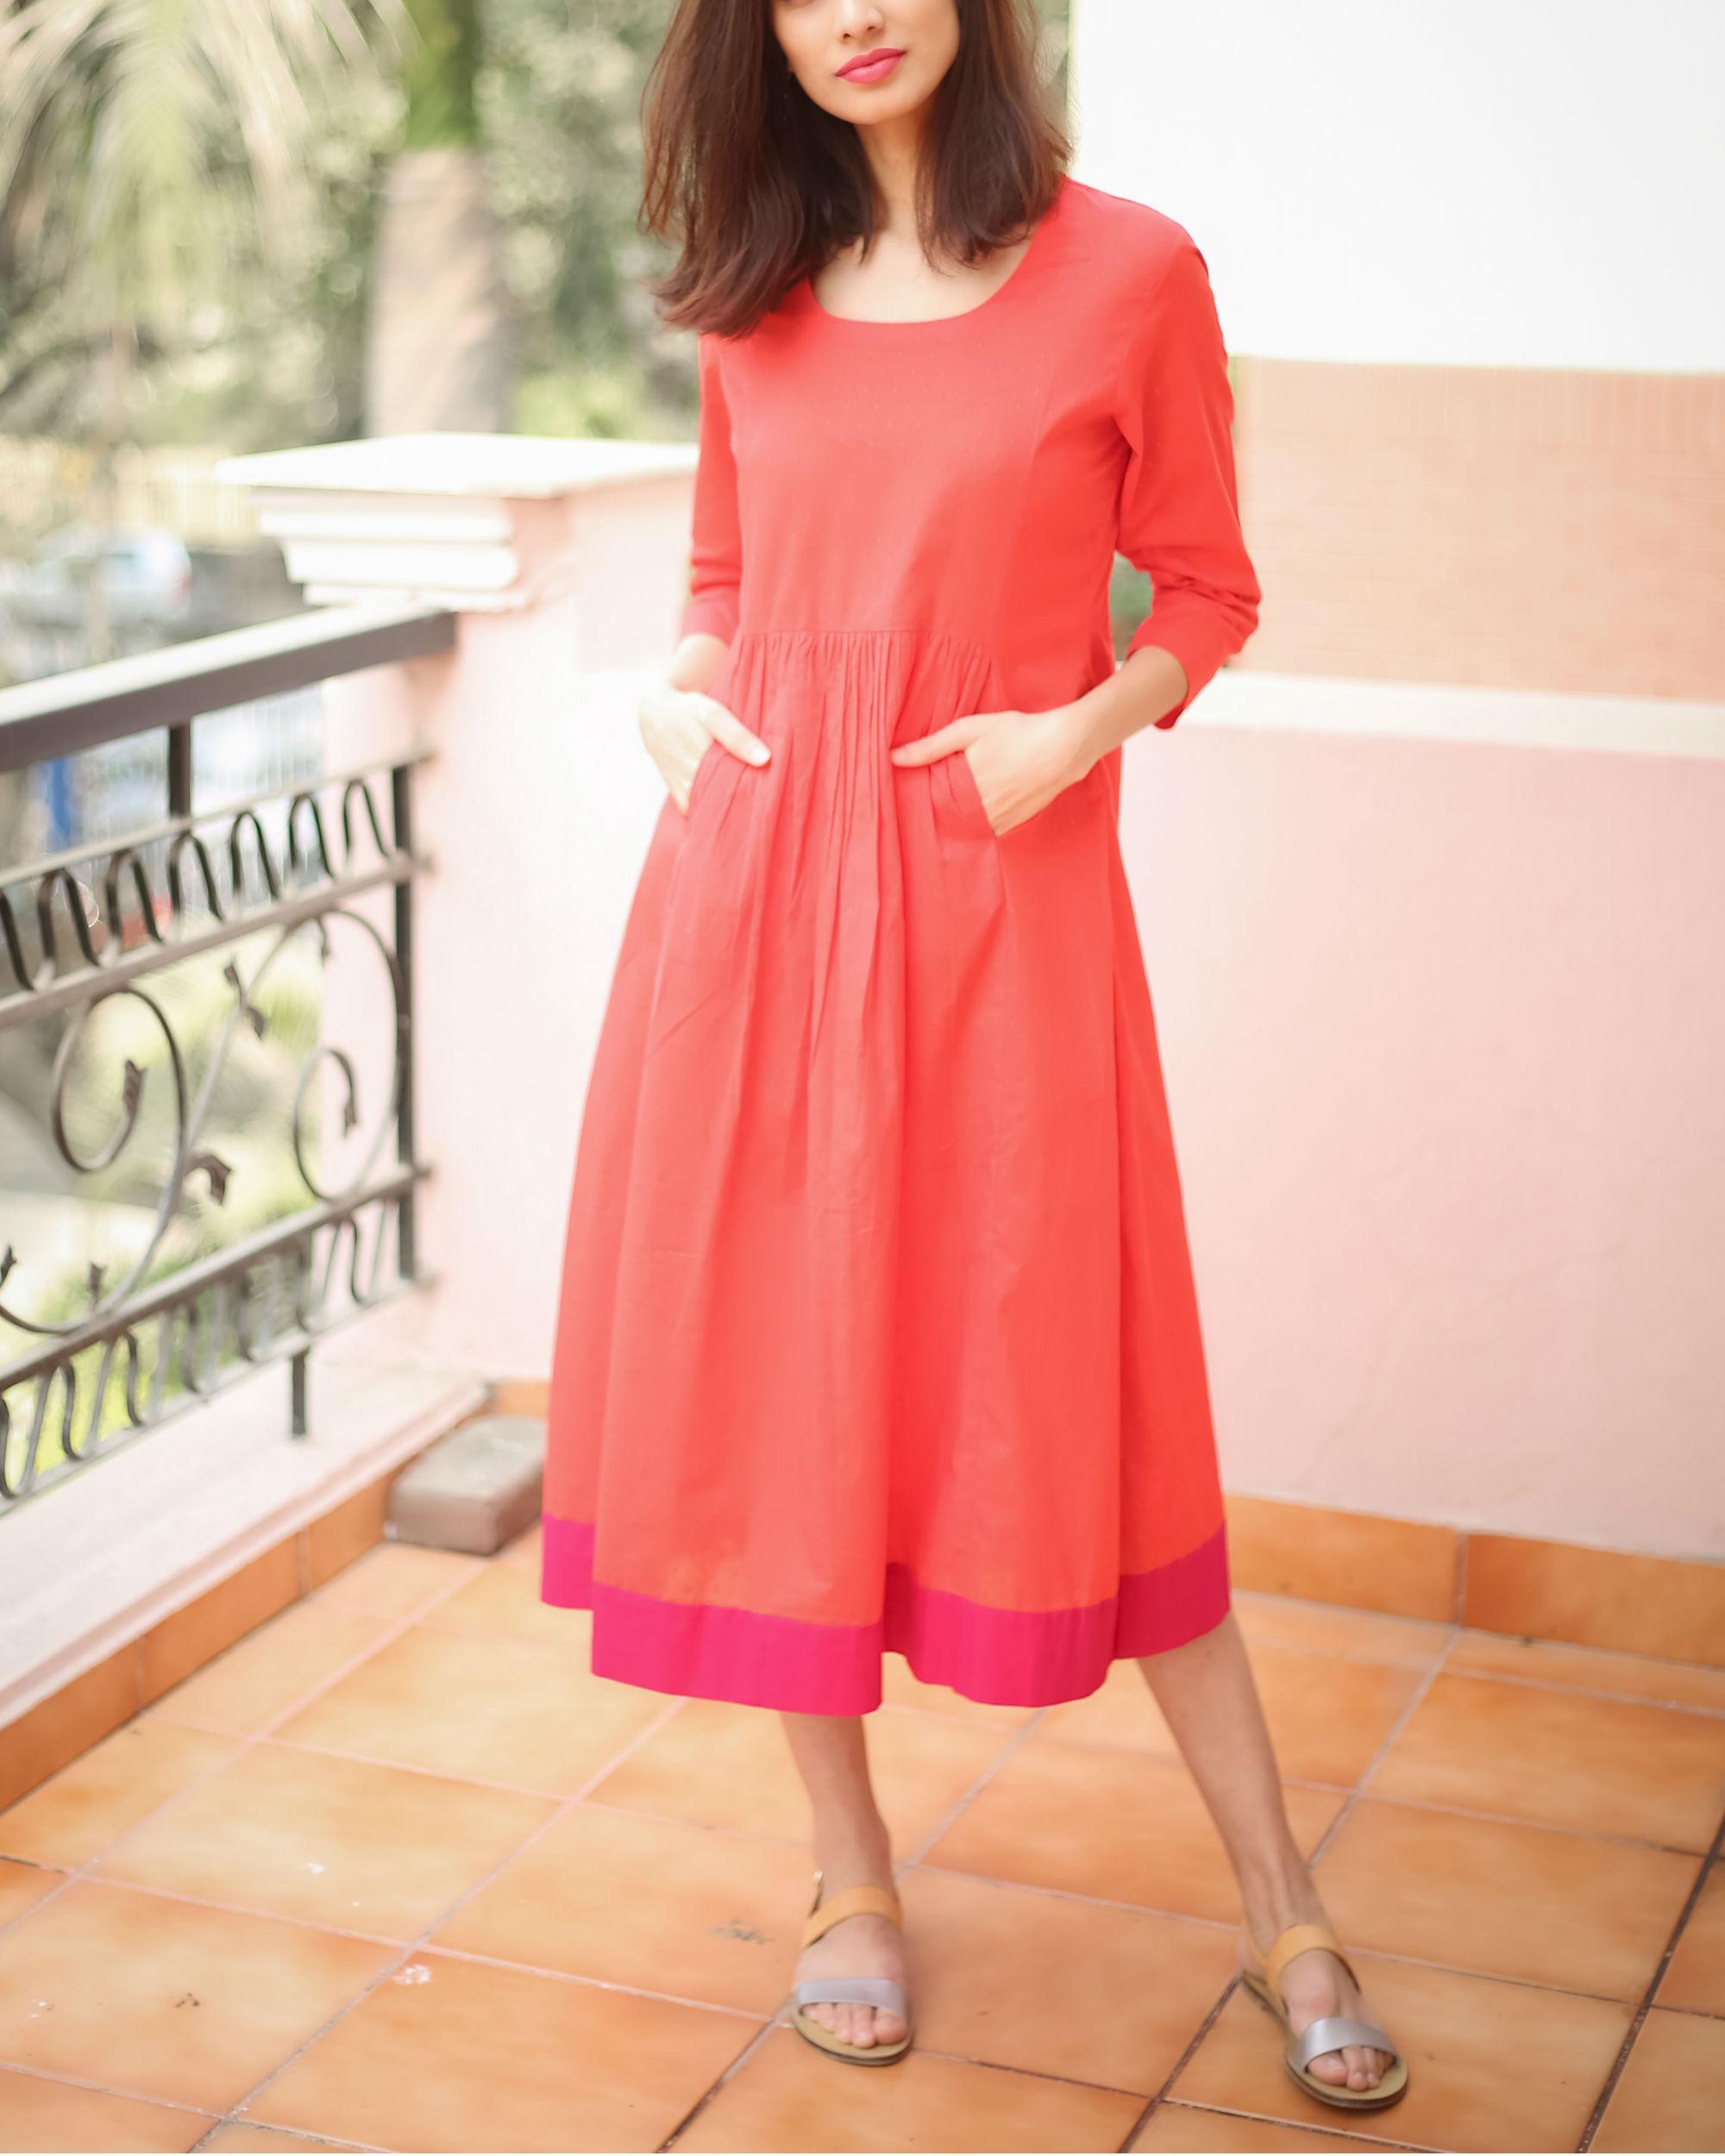 Textured Red Maxi Dress